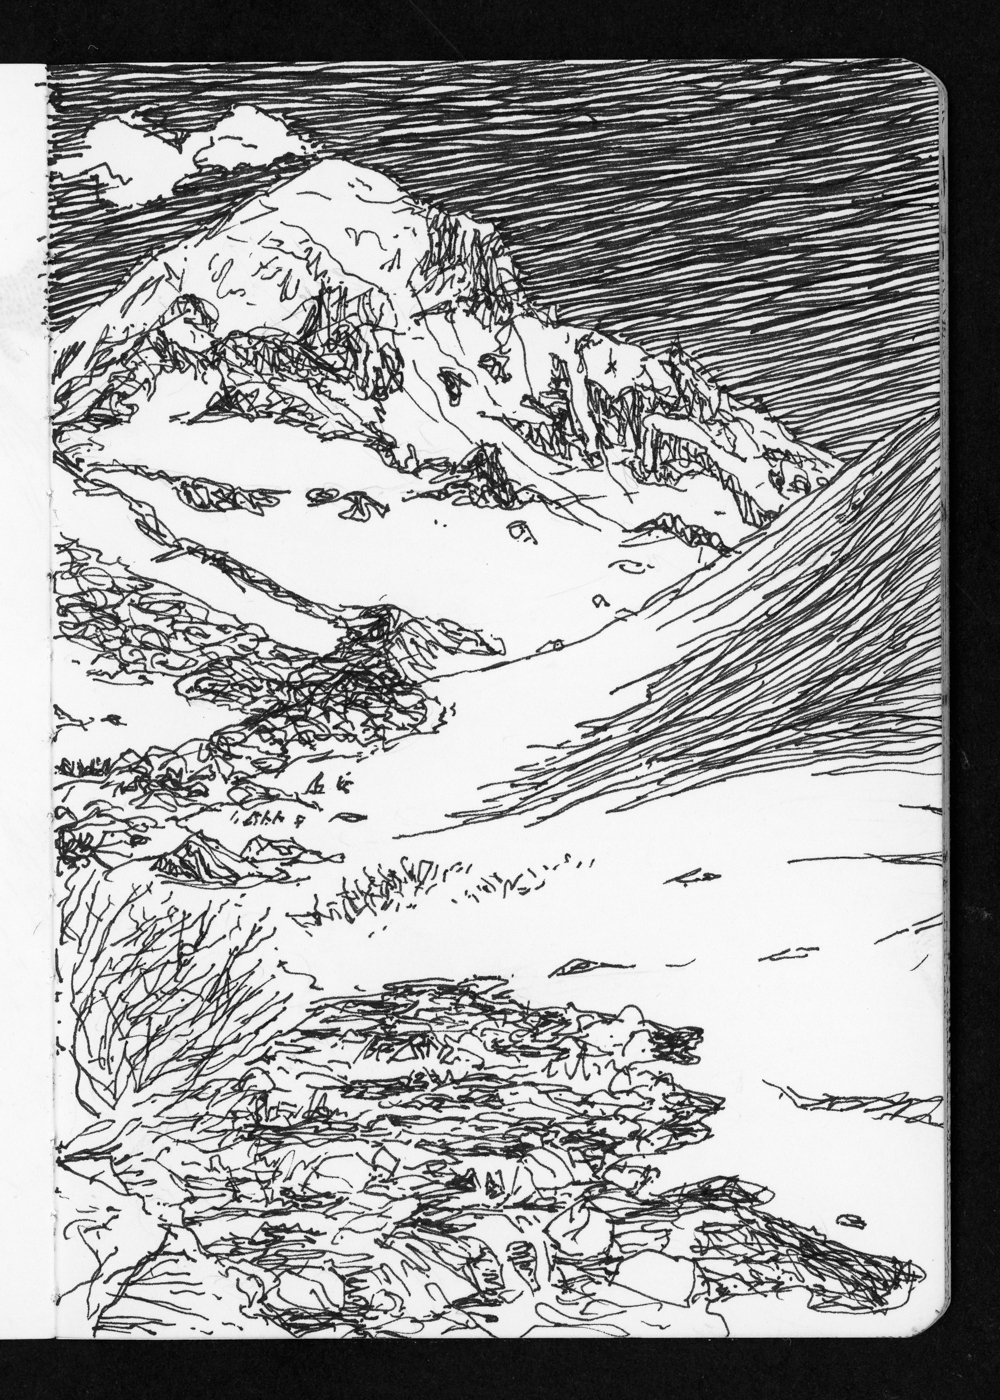 05-13 Glacial stream beneath Gilsan Glacier on Mt hood.jpg